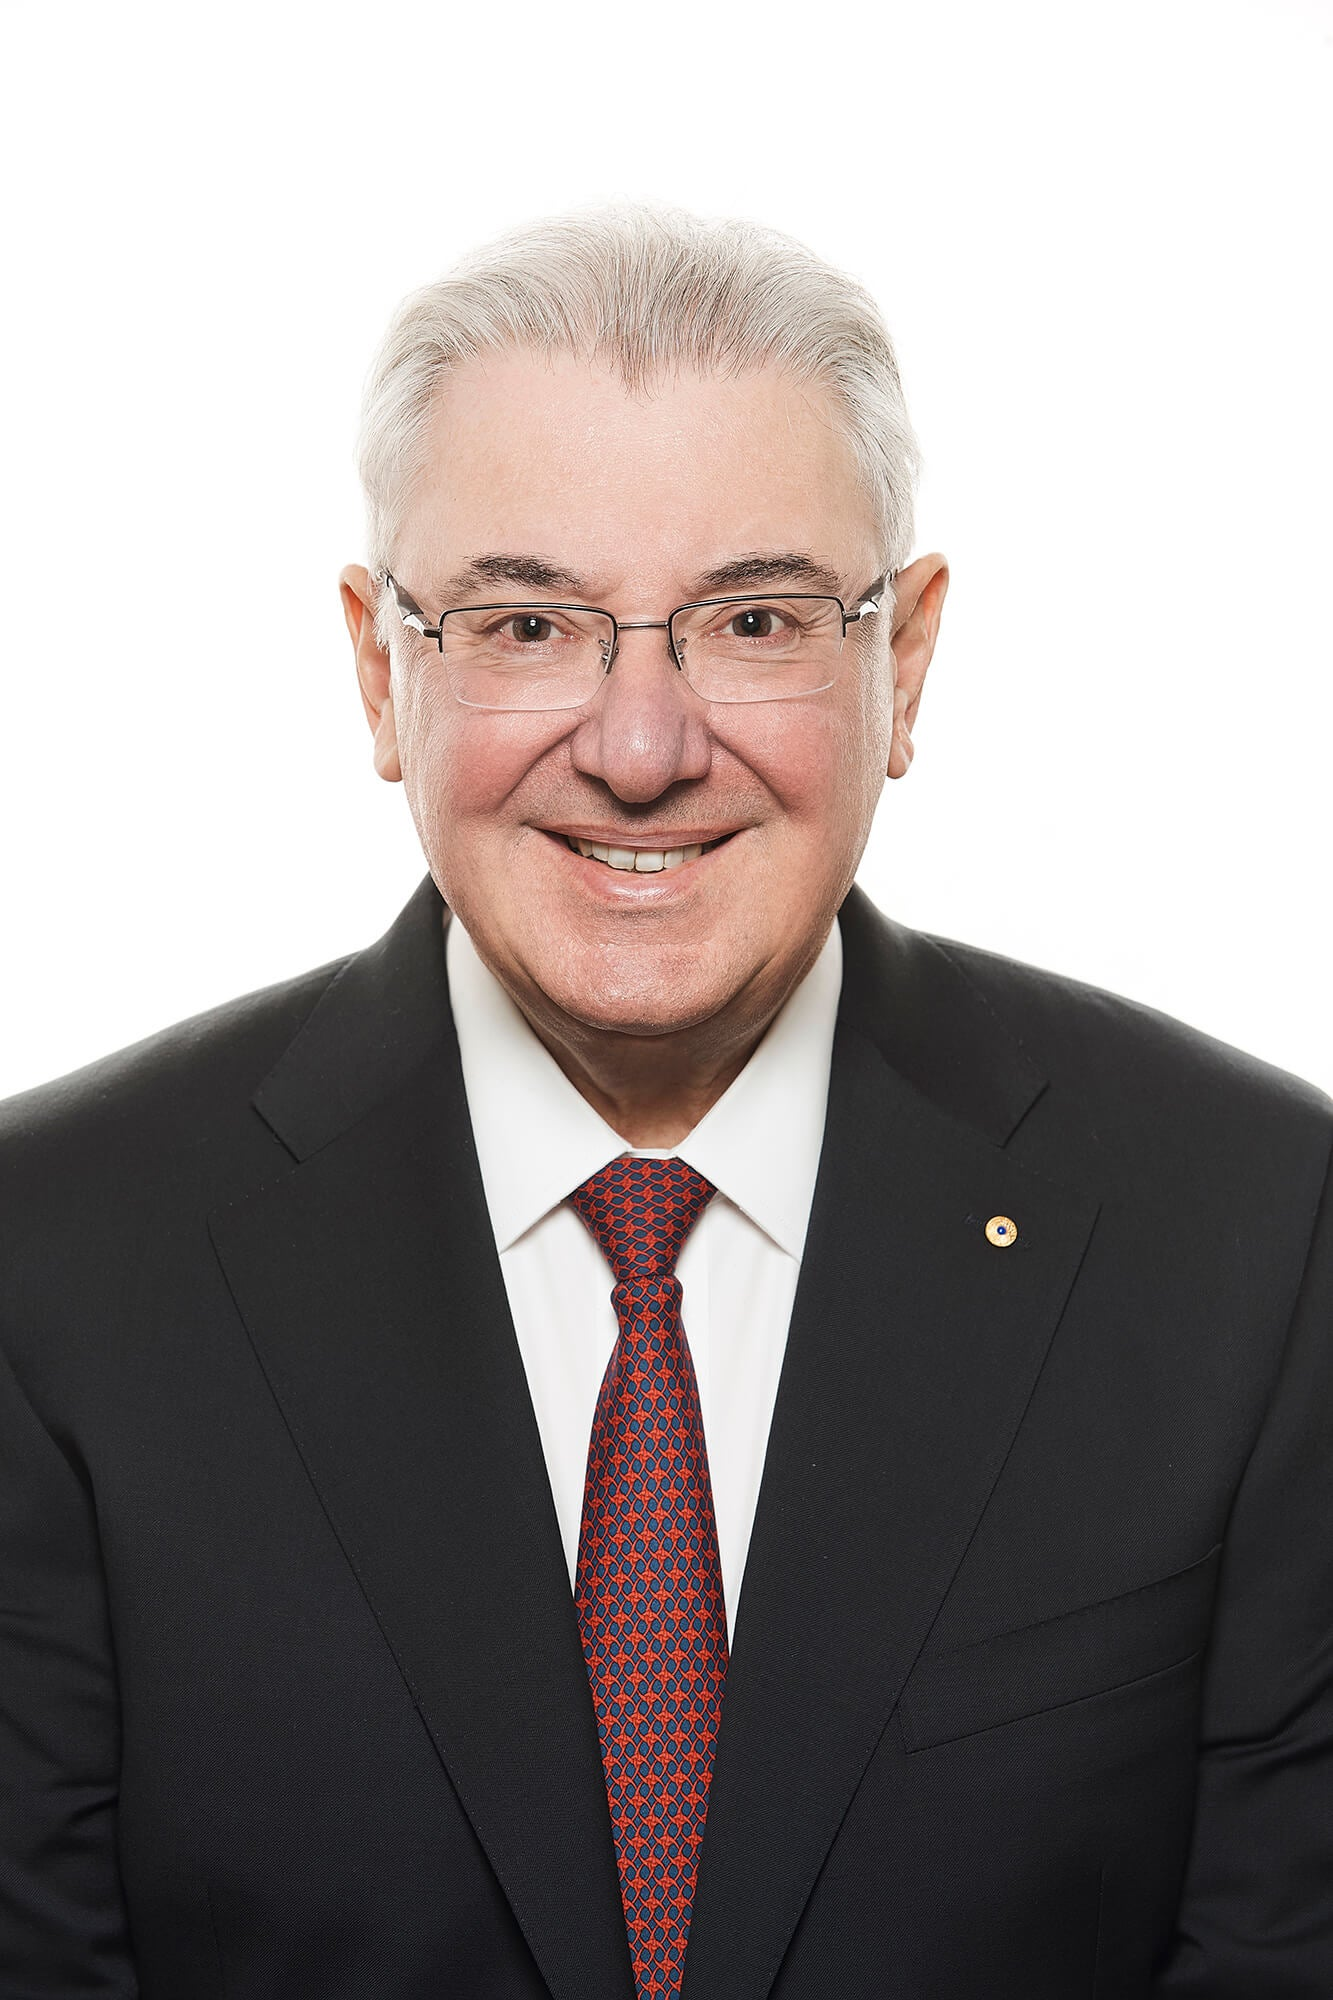 Ian Robertson AO